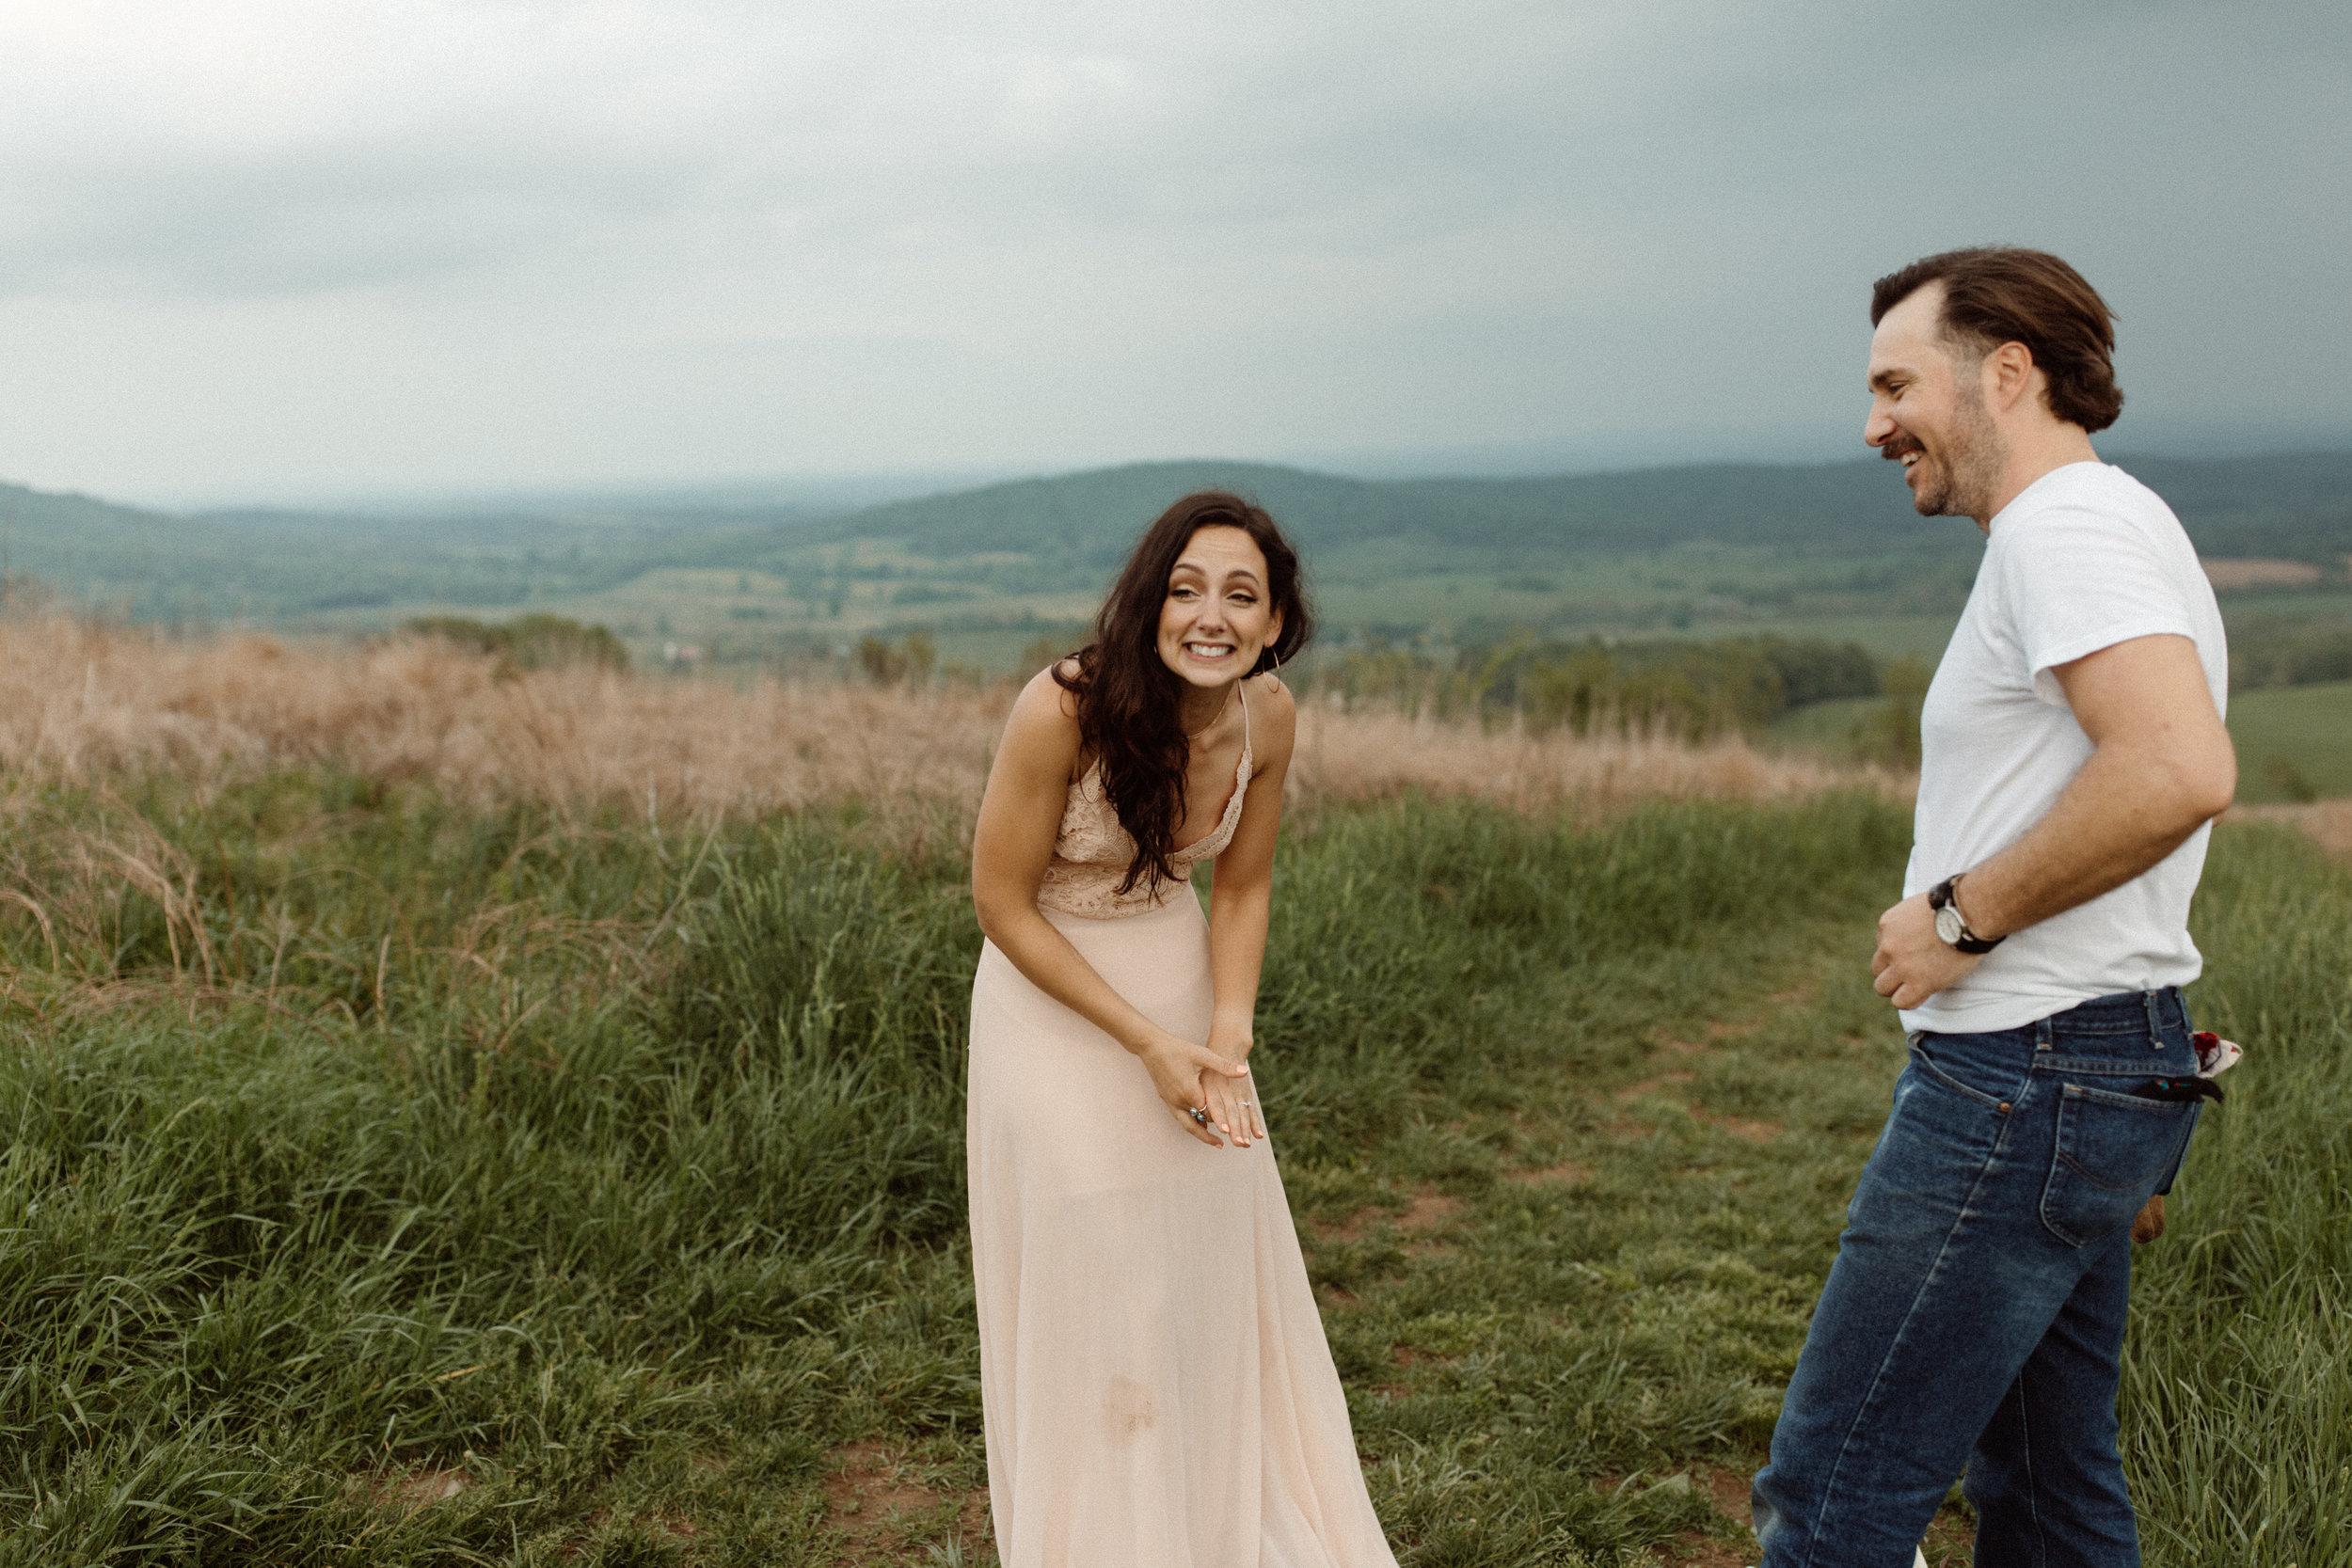 kelsey&mark-engagement-skymeadows-2019-peytoncurry-9858.jpg